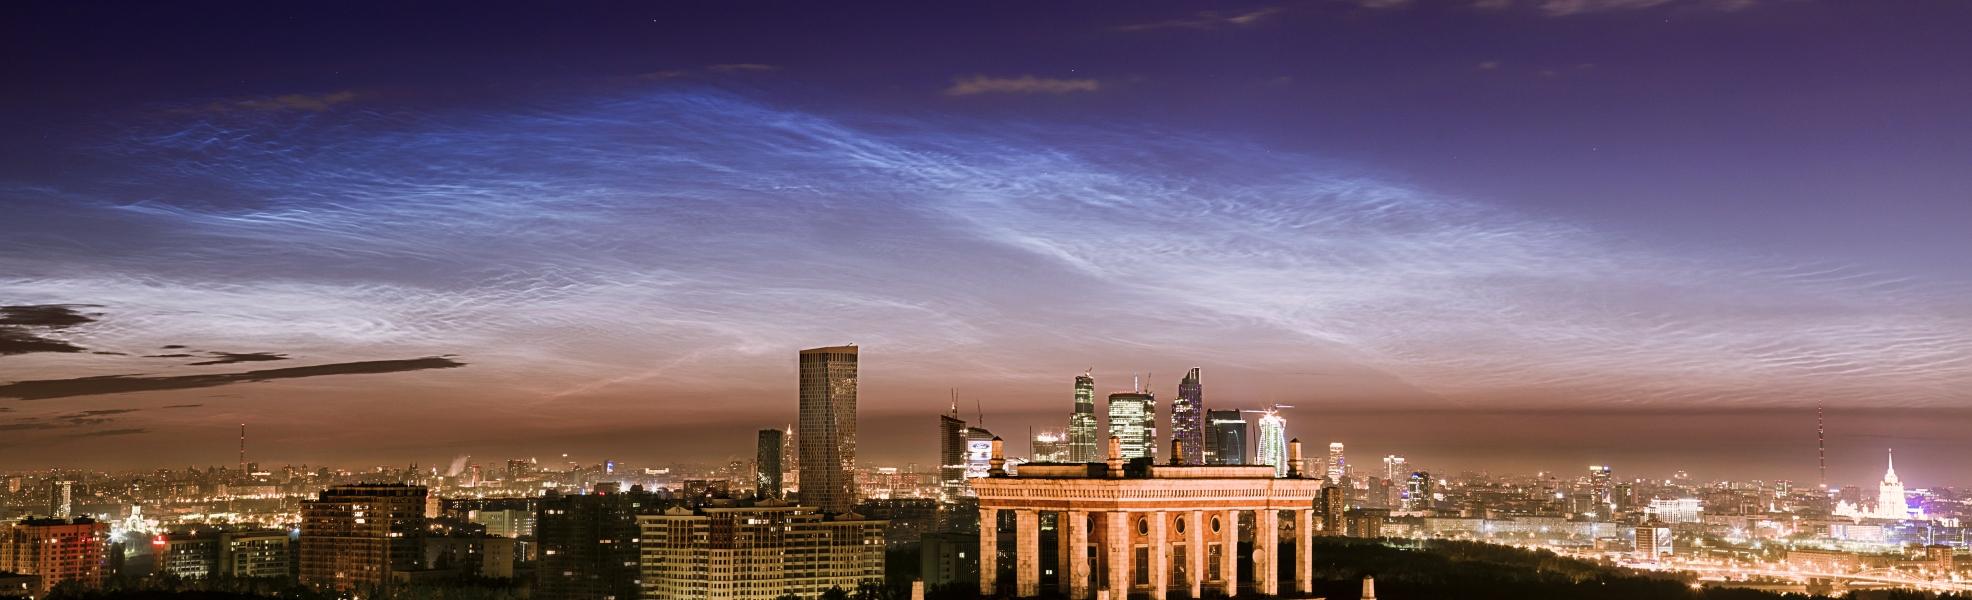 Nubes noctilucentes sobre Moscú